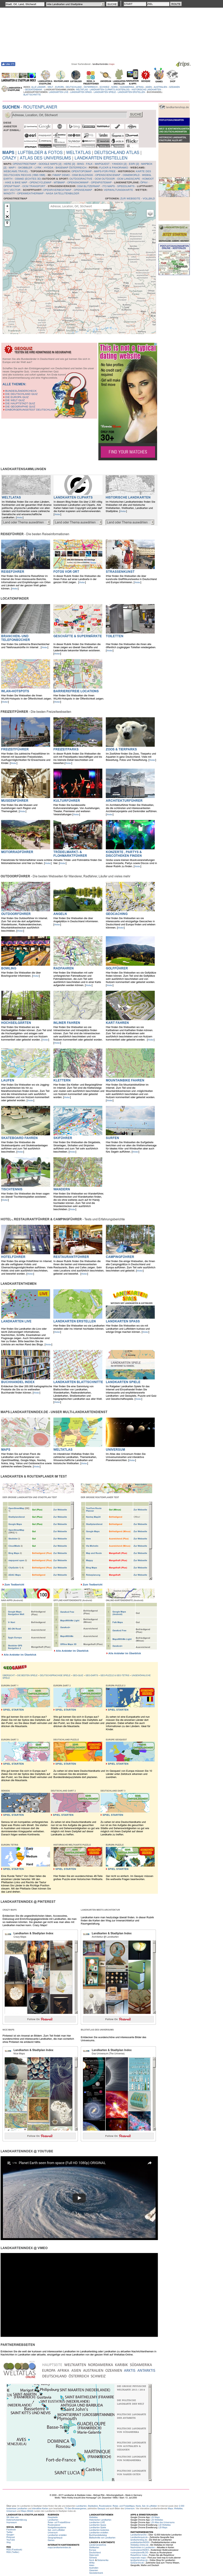 Landkarten Und Stadtplan Index Competitors, Revenue and